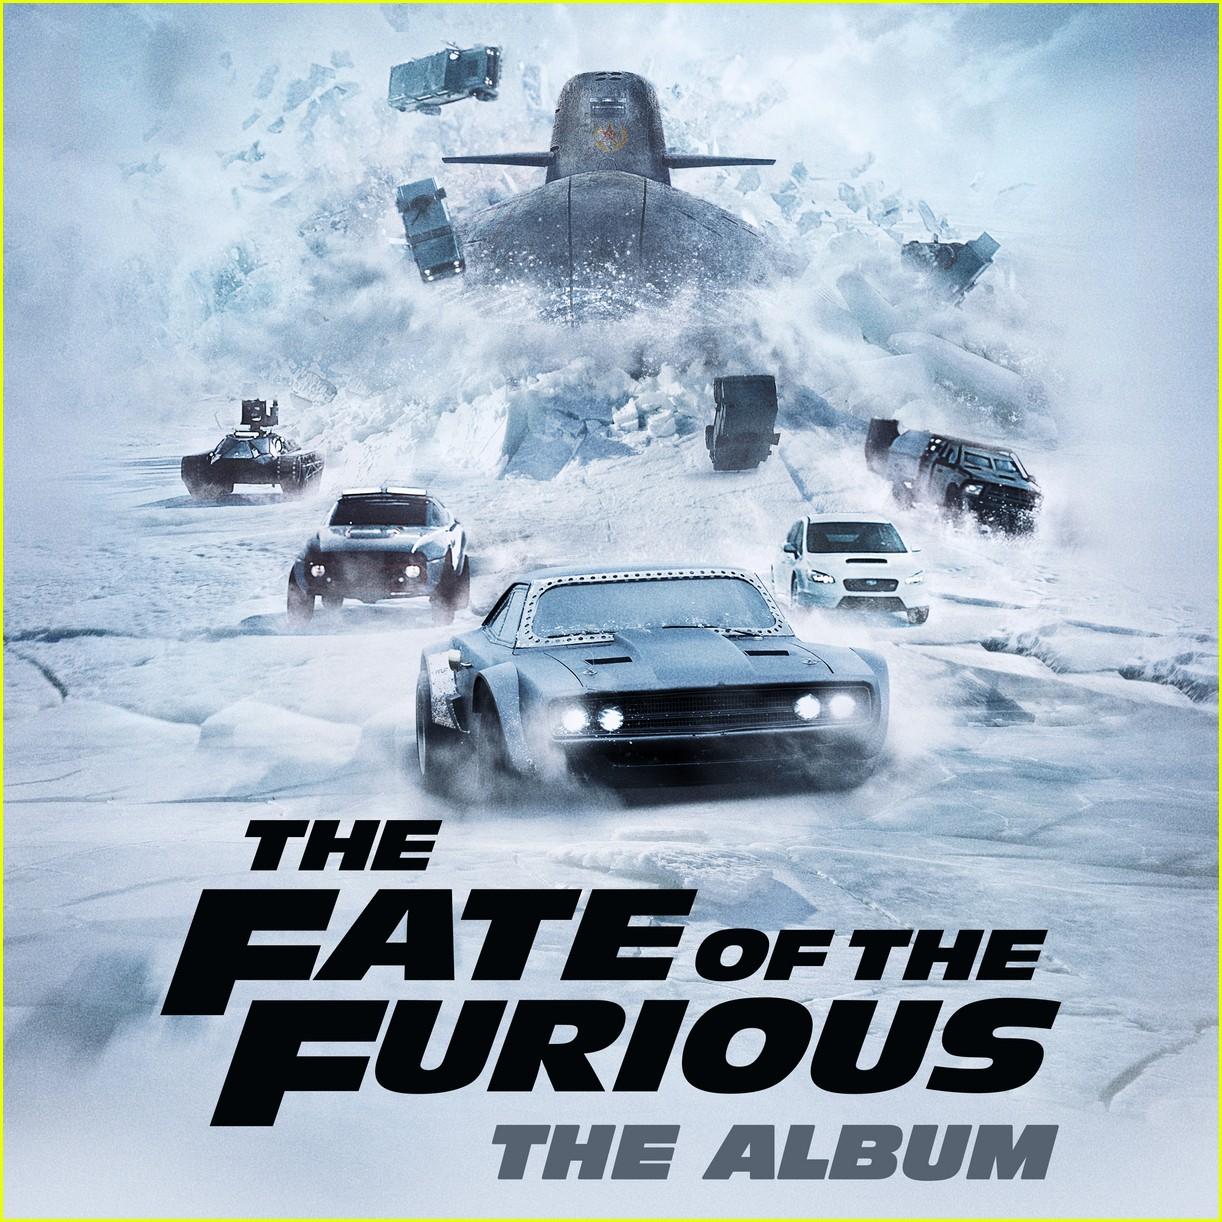 watch pitbull camila cabello and j balvin in hey ma english vesion music video 013883544